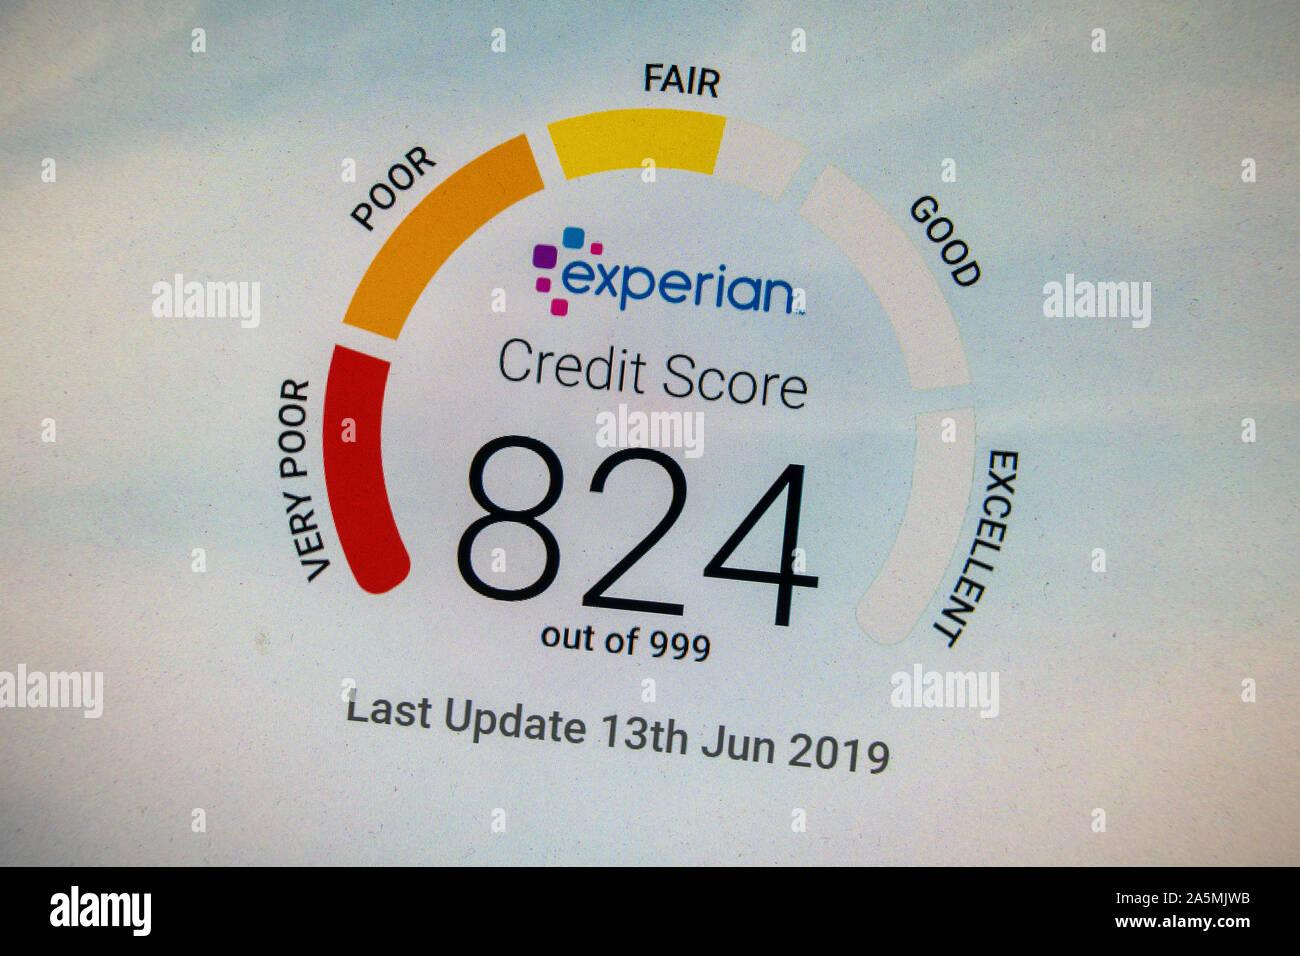 Screen shot of an Experian Credit Score screen showing a massive